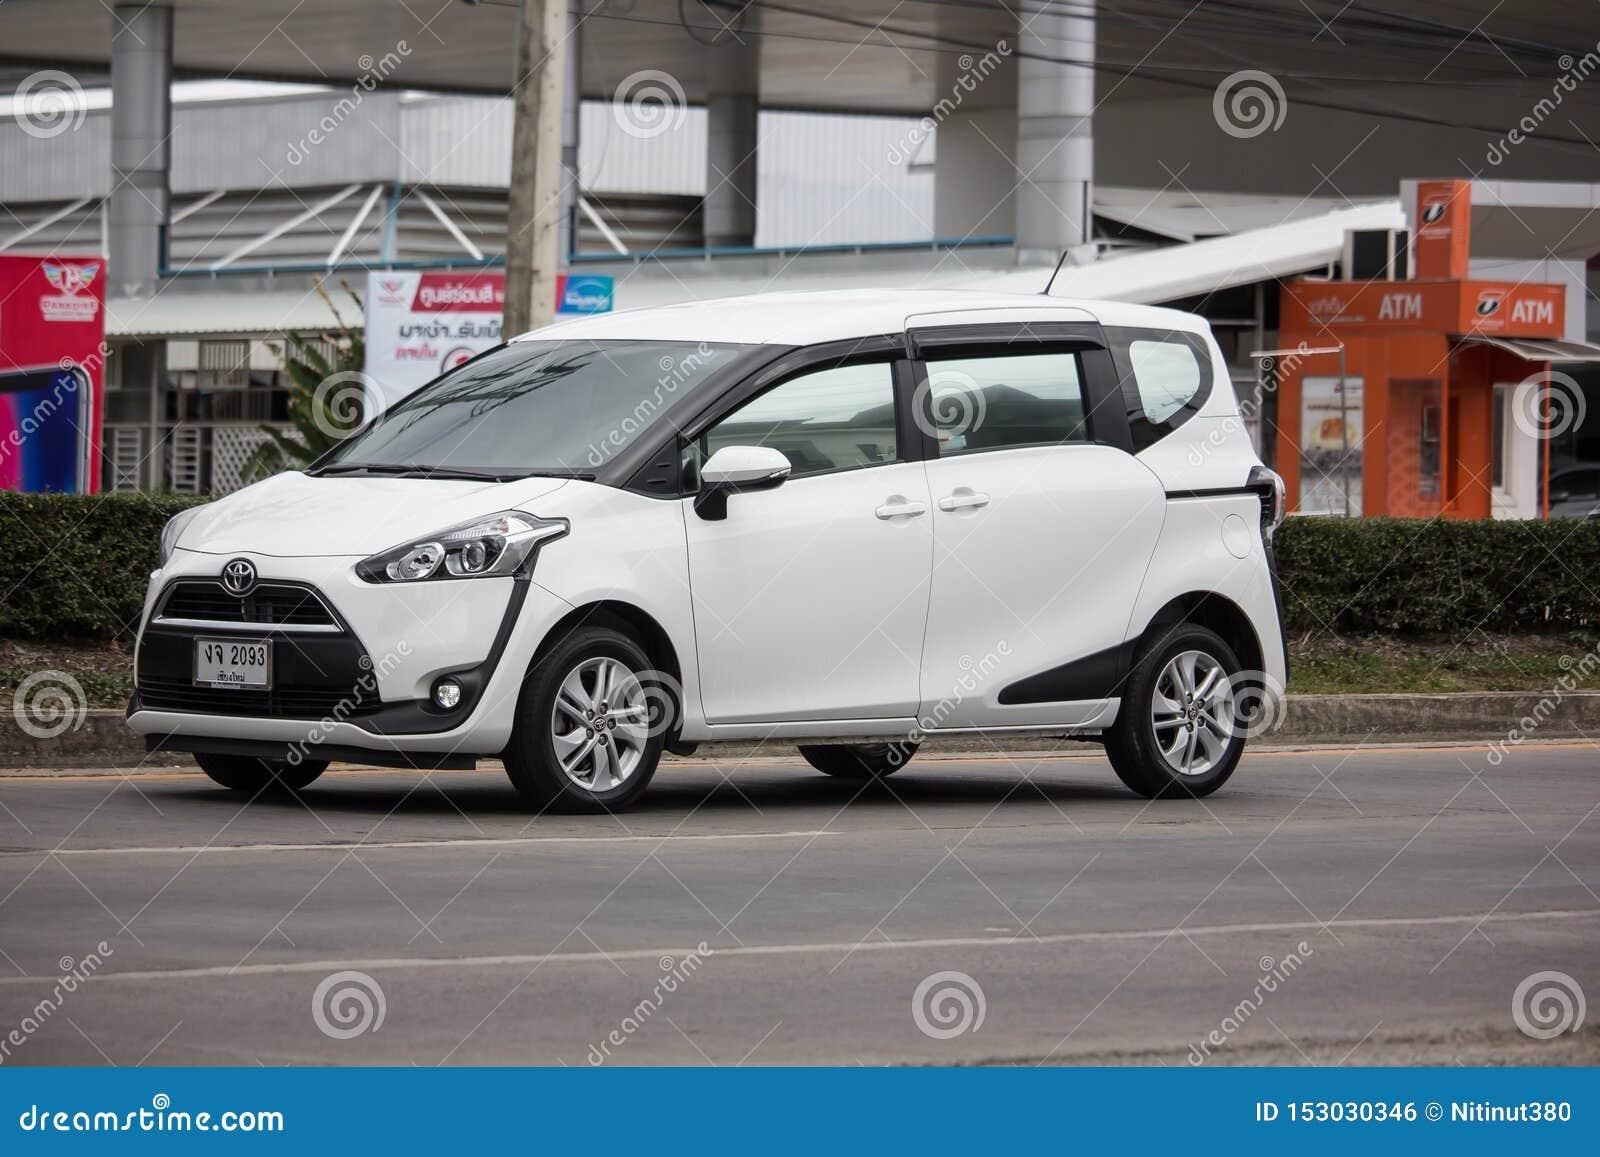 Kelebihan Kekurangan Toyota Sienta 2019 Perbandingan Harga